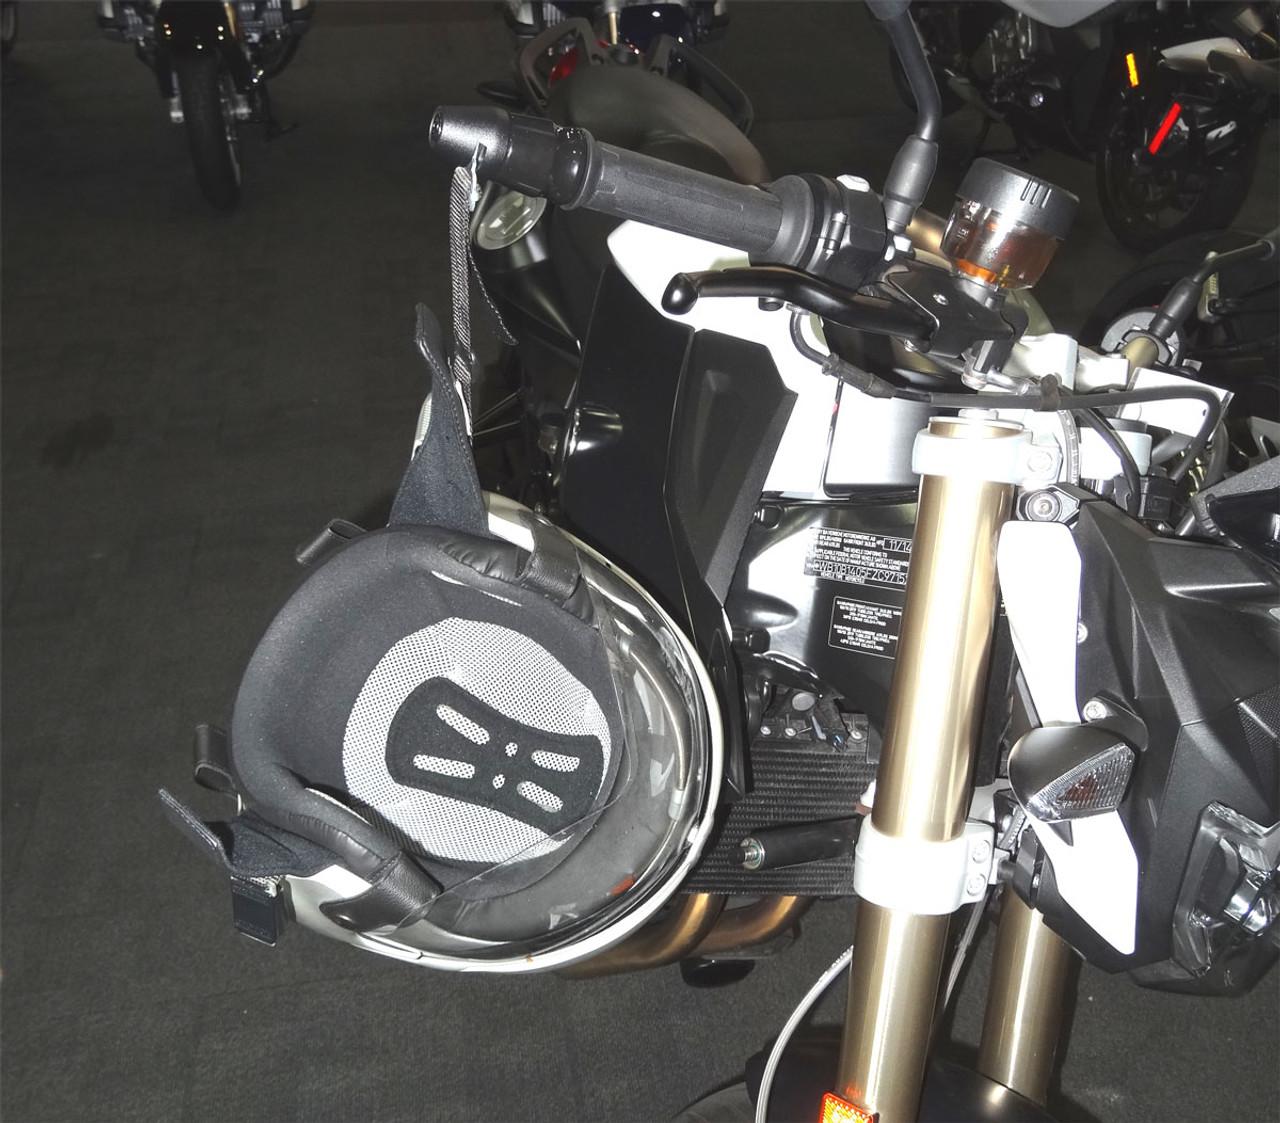 1053-B, Lidlox Single, BMW F800R and S1000R, Black